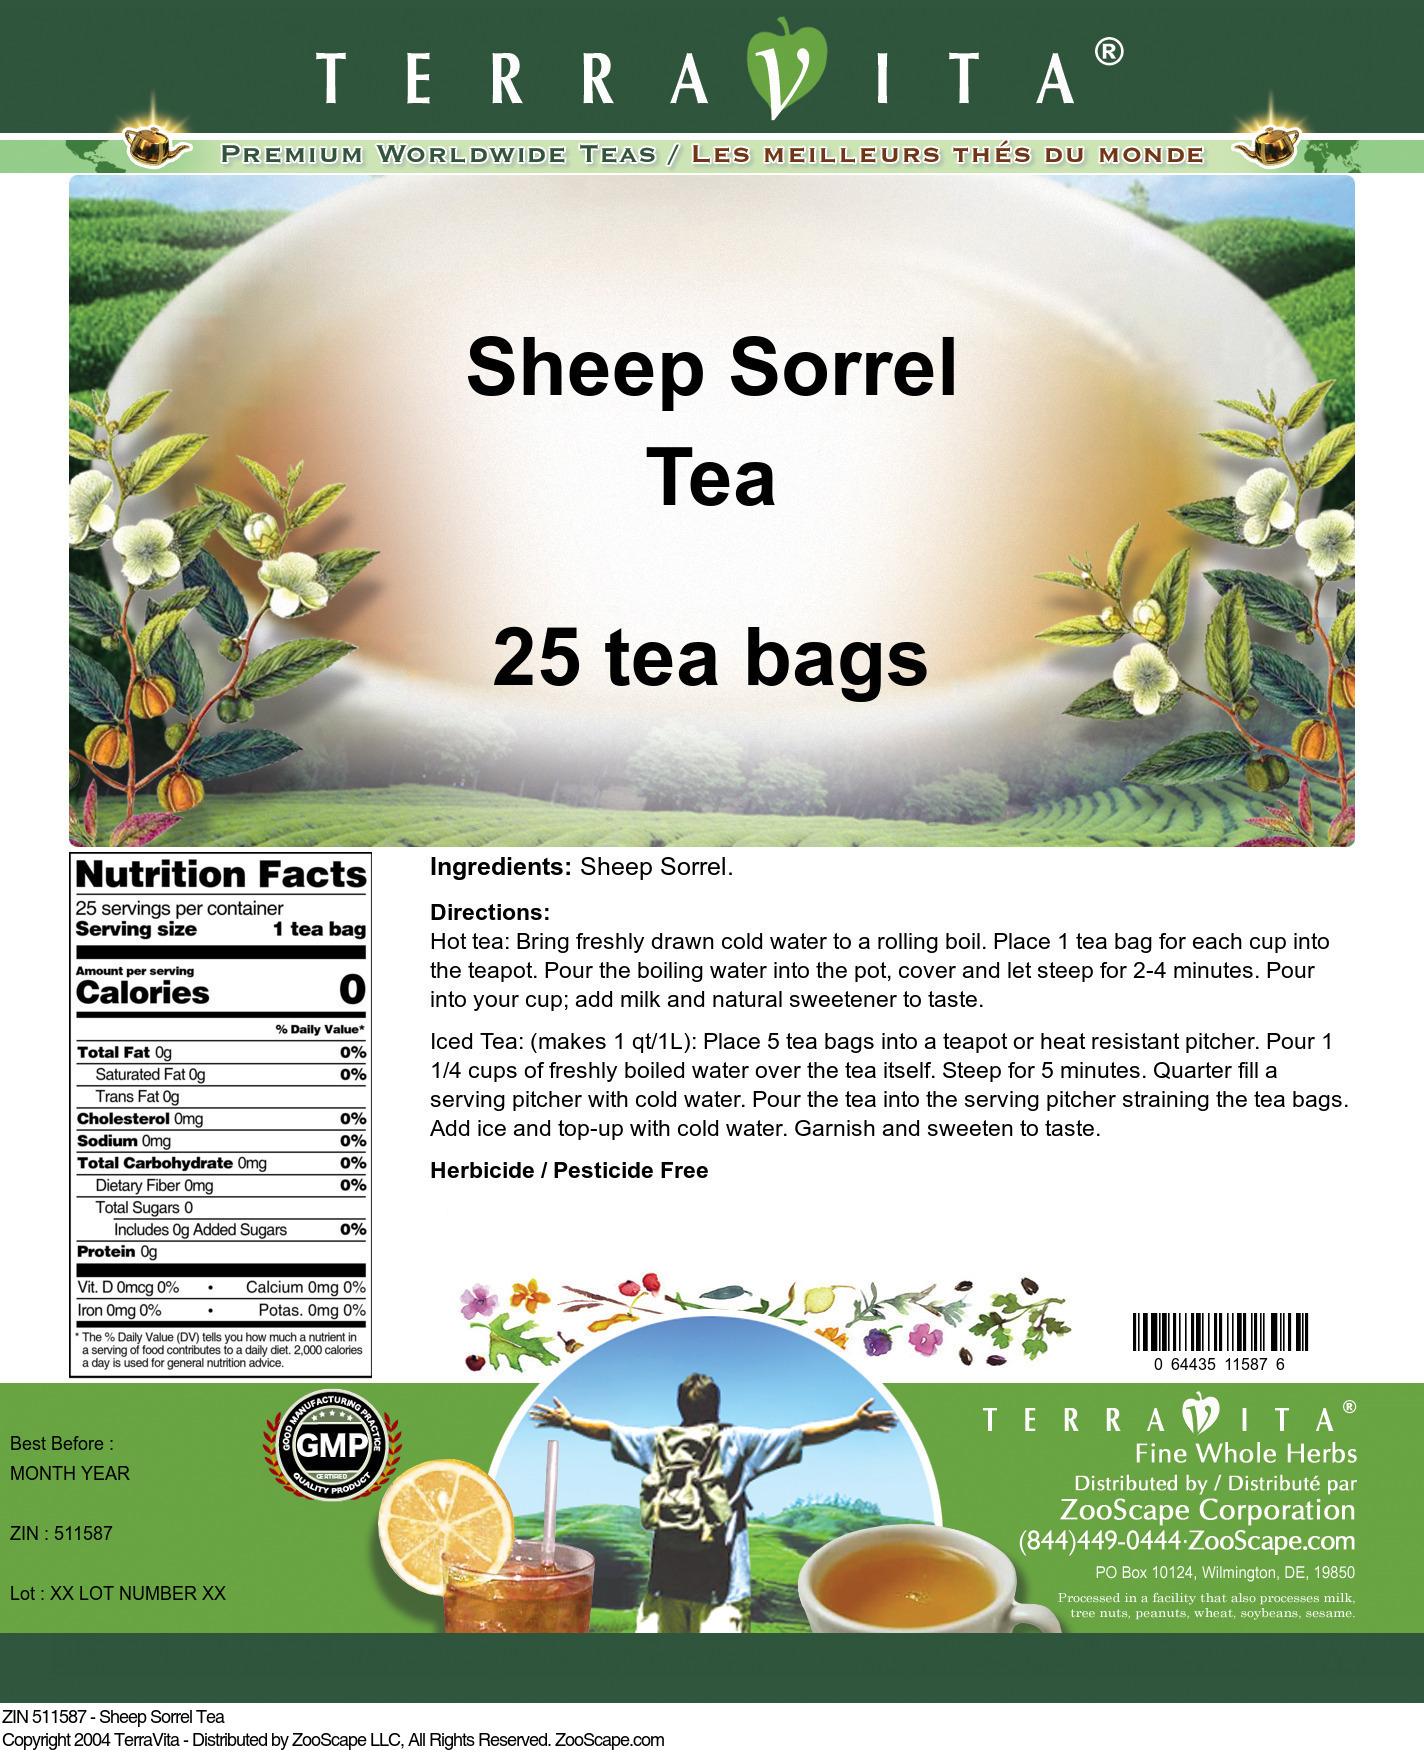 Sheep Sorrel